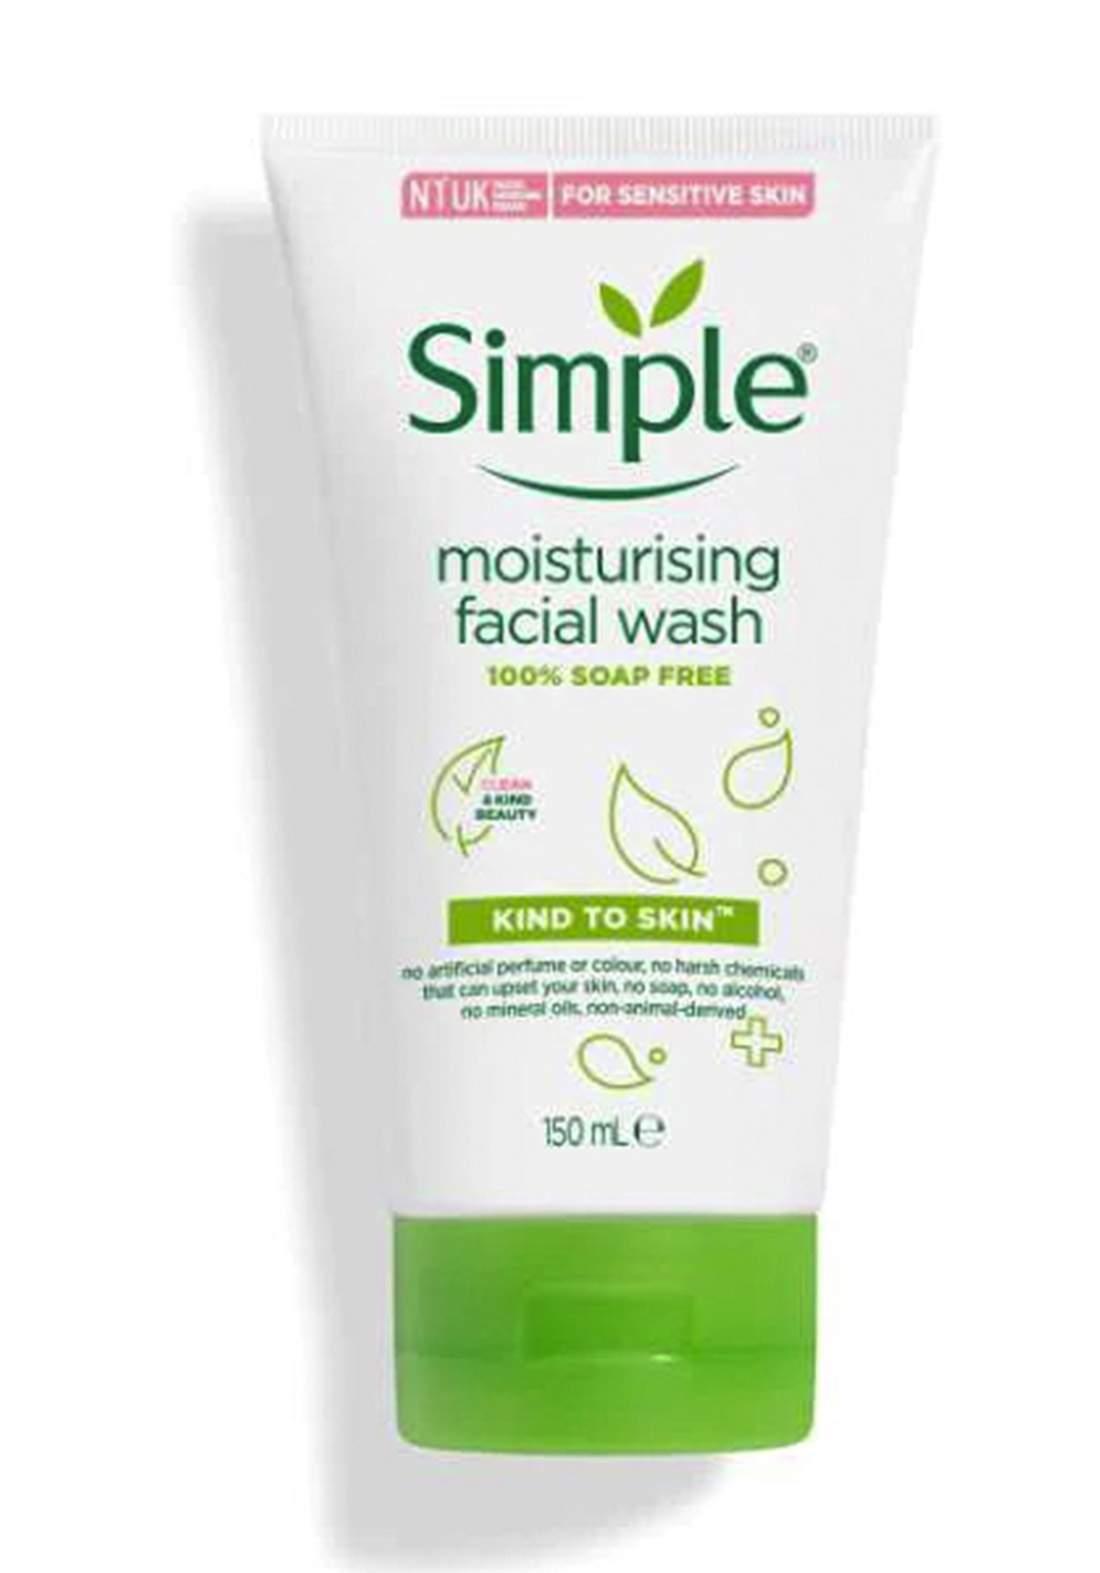 Simple (114111) Moisturising Facial Wash Gel For Sensetive Skin 150ml غسول الوجه للبشرة الحساسة